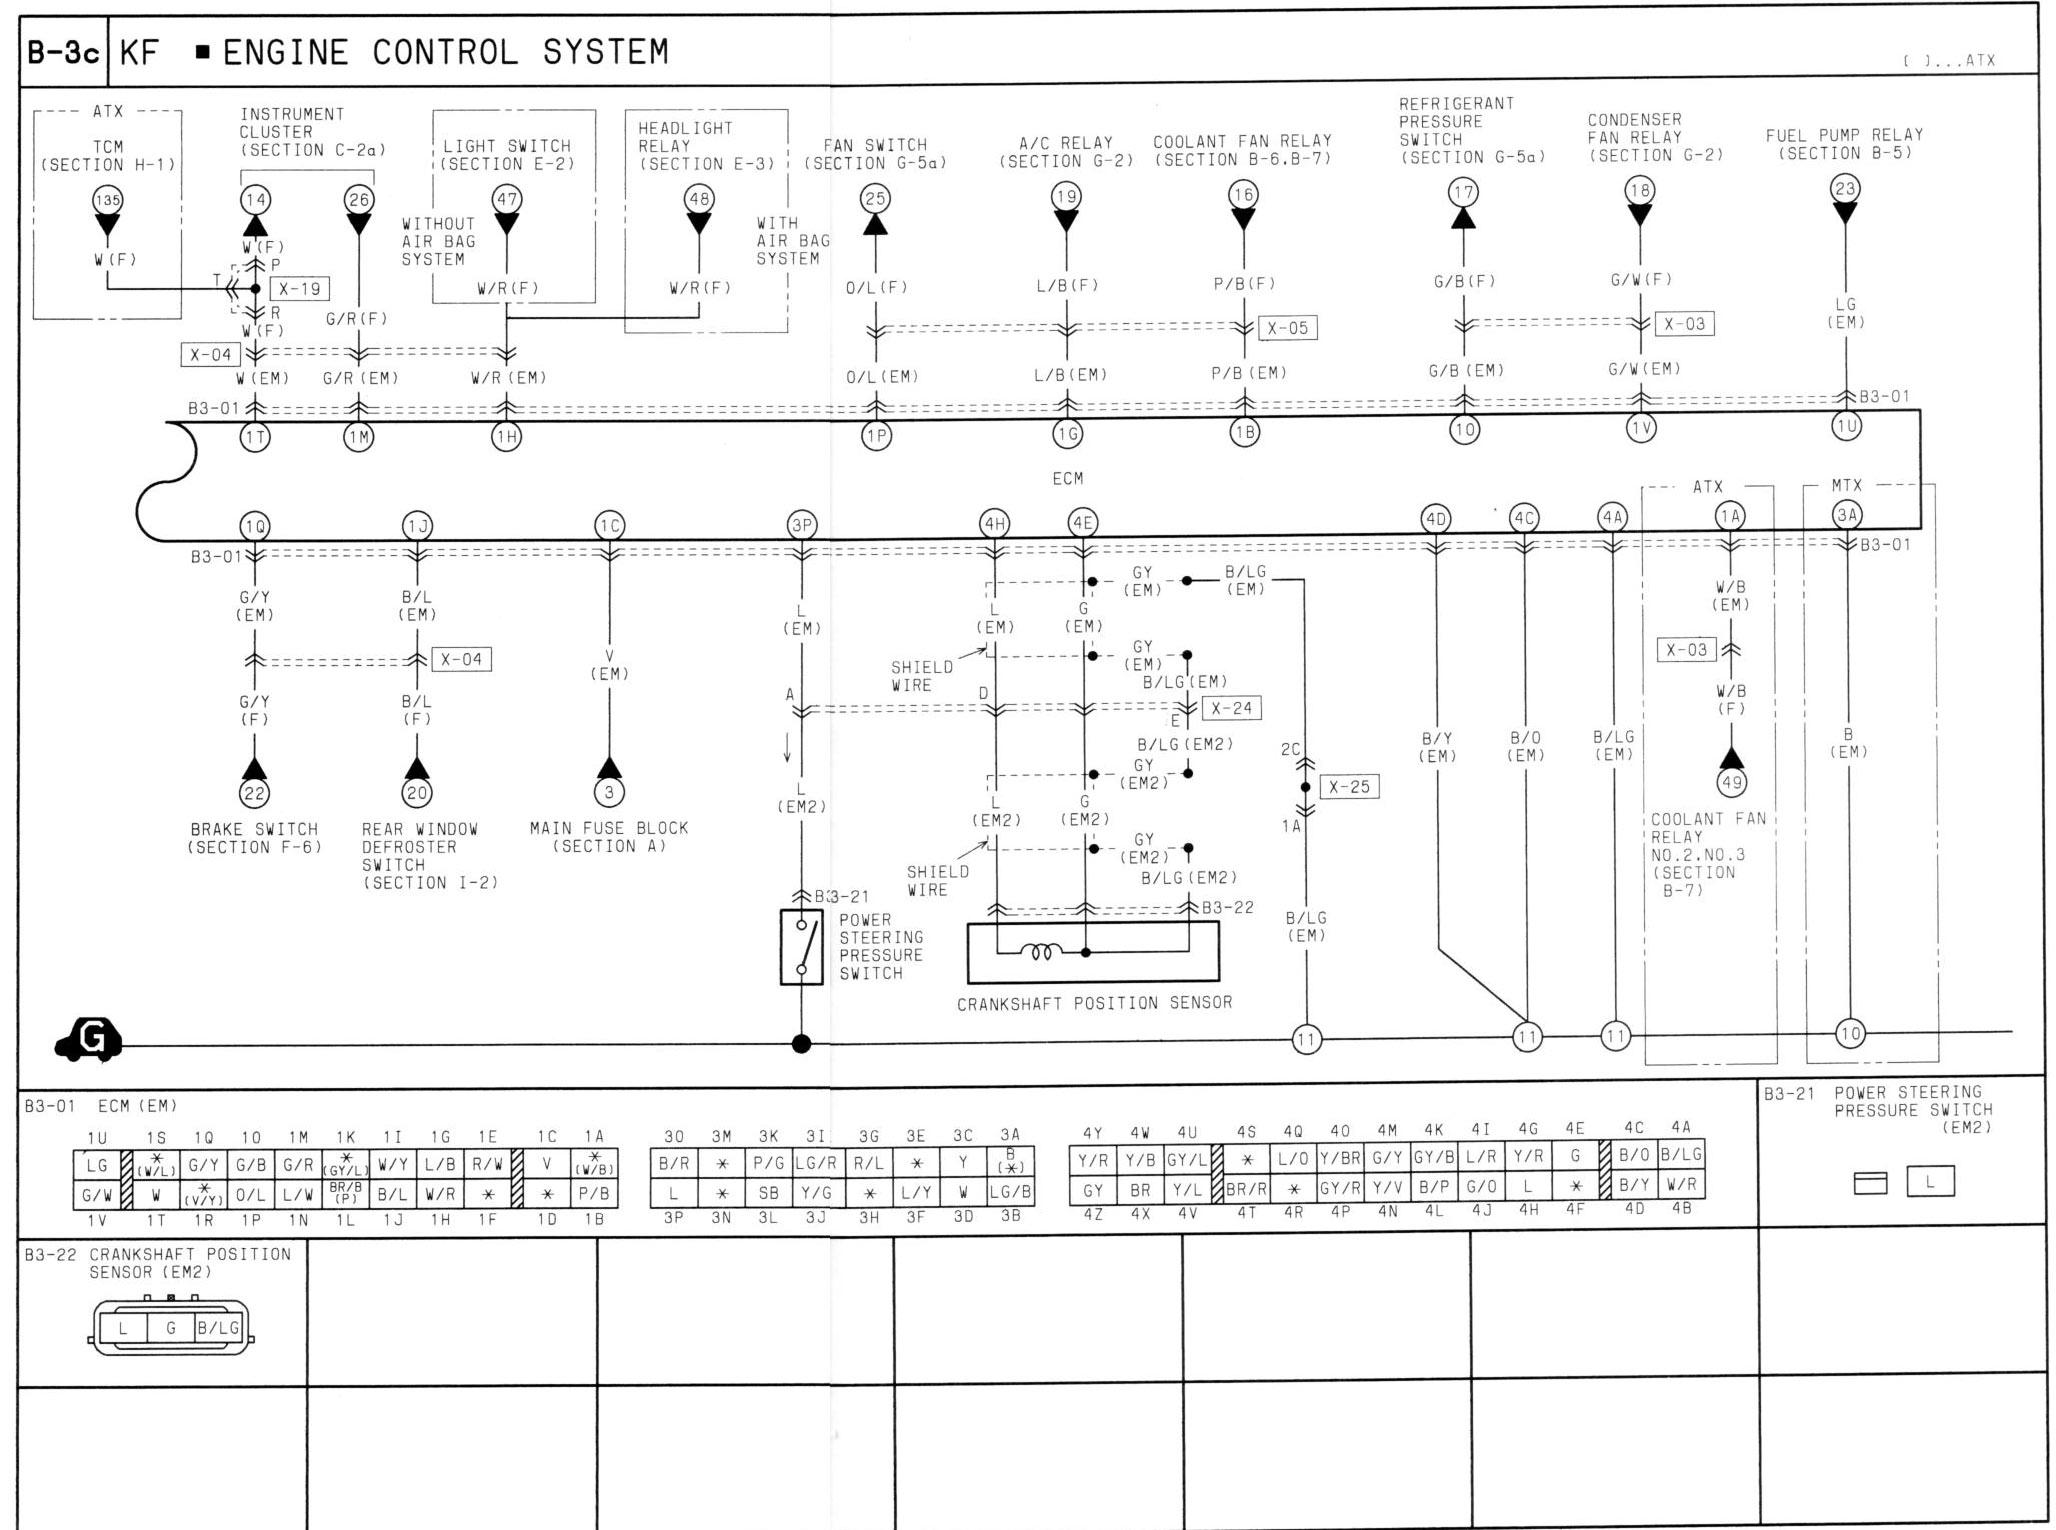 mazda midge wiring diagram mazda atv contactor wiring diagram, Wiring diagram